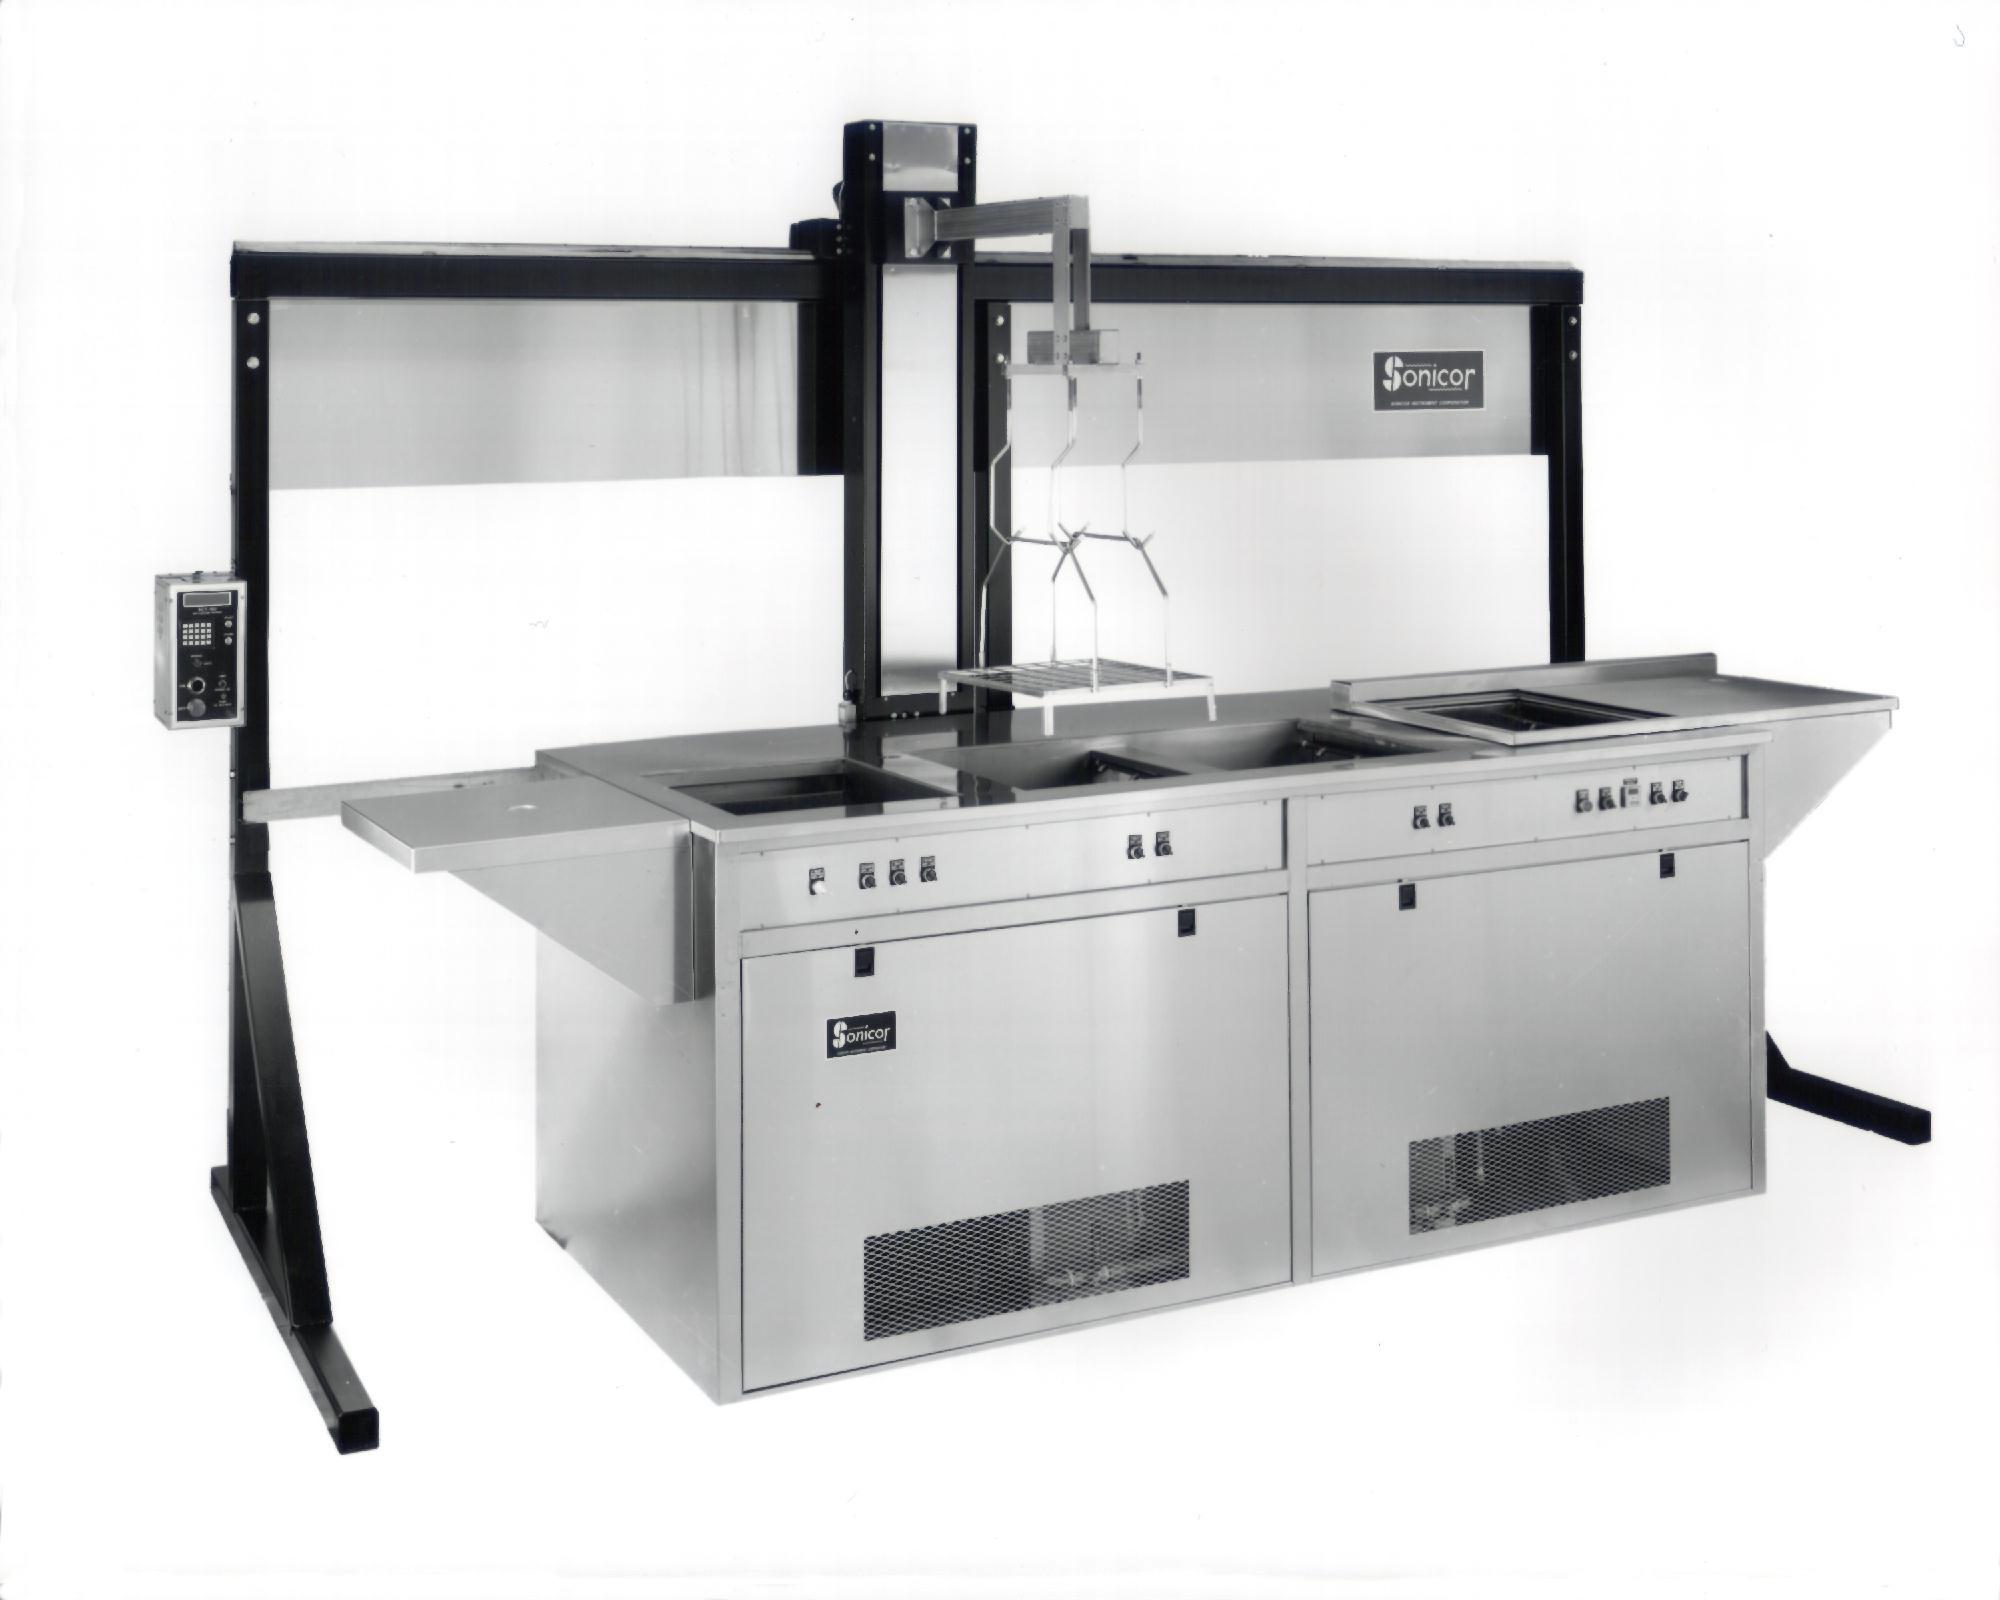 Sonicor Ultrasonic Cleaning Equipment